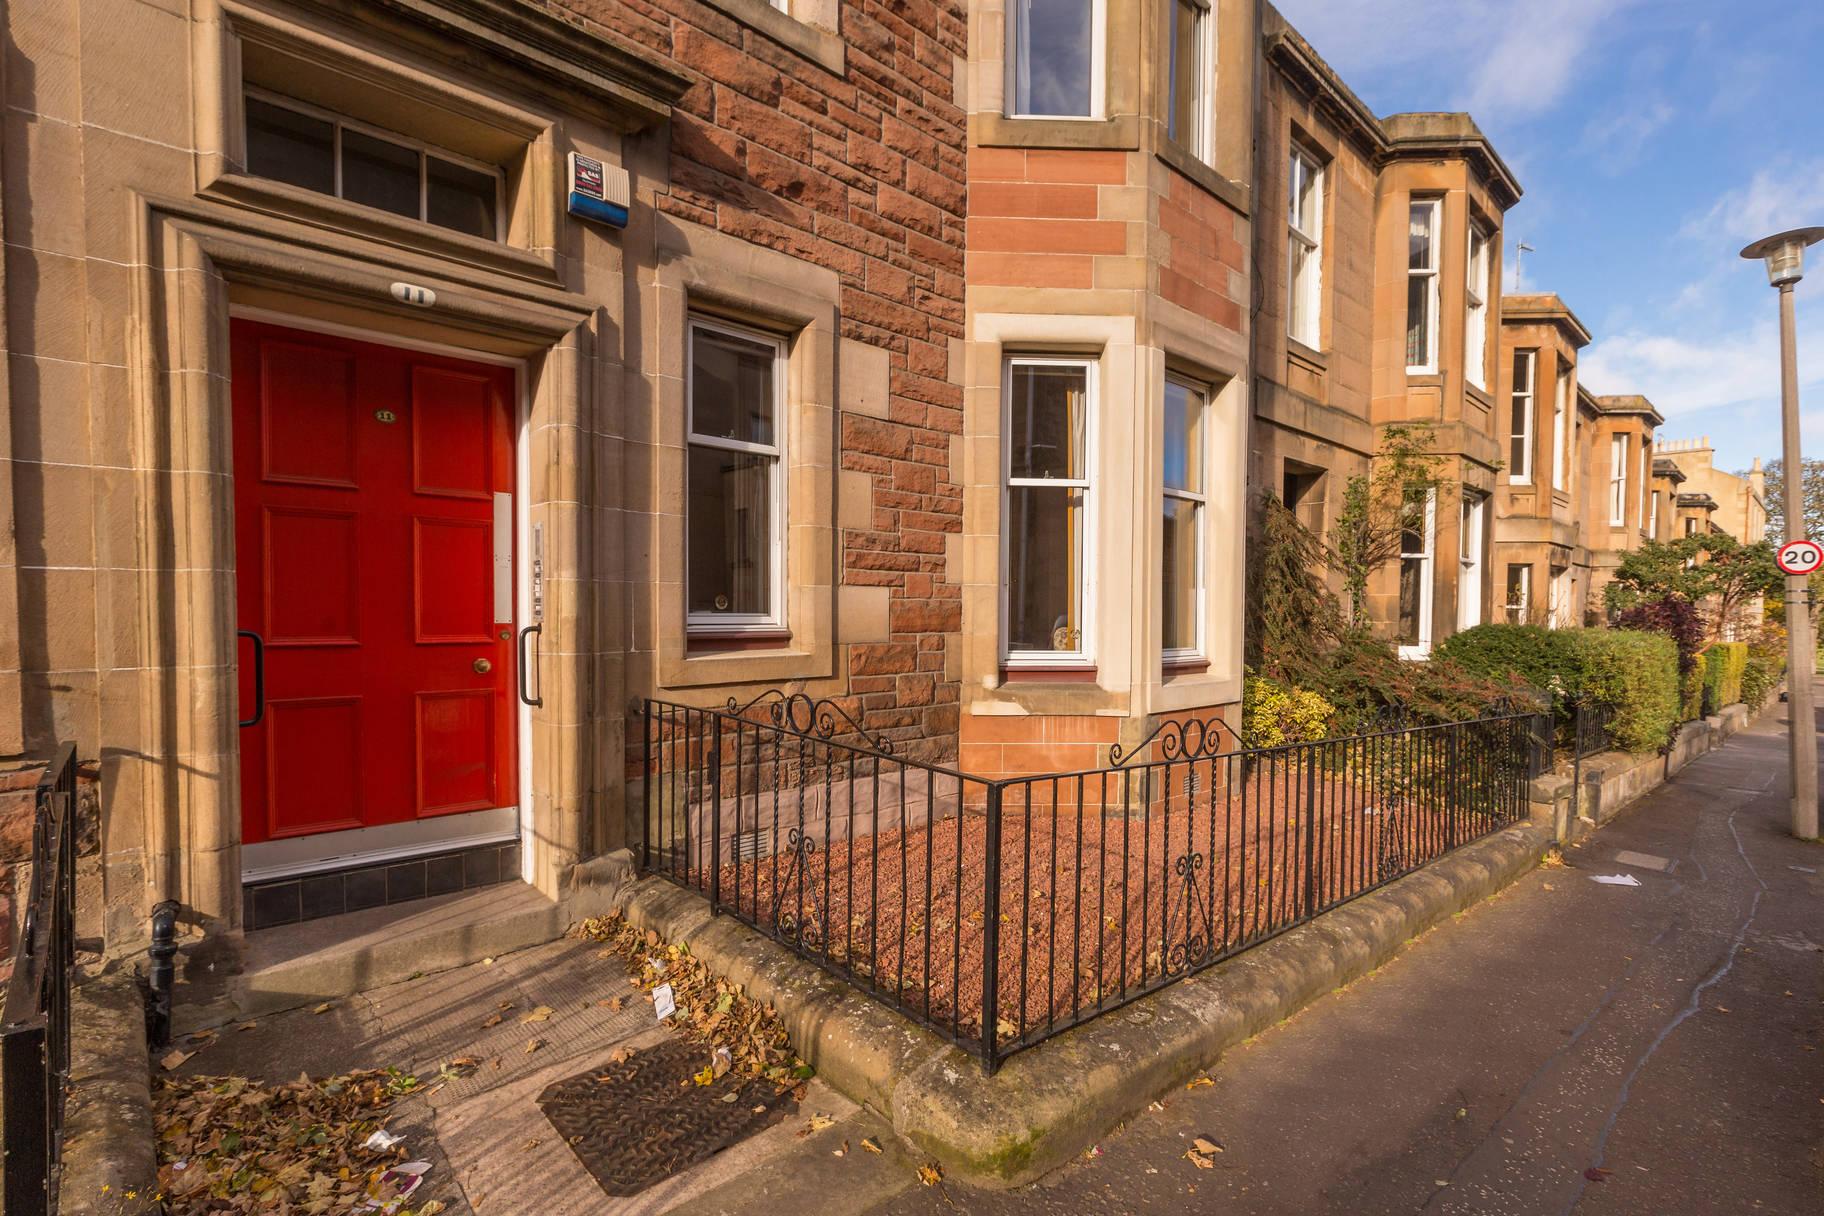 11 (PF2) Sylvan Place, Marchmont, Edinburgh, EH9 1LH